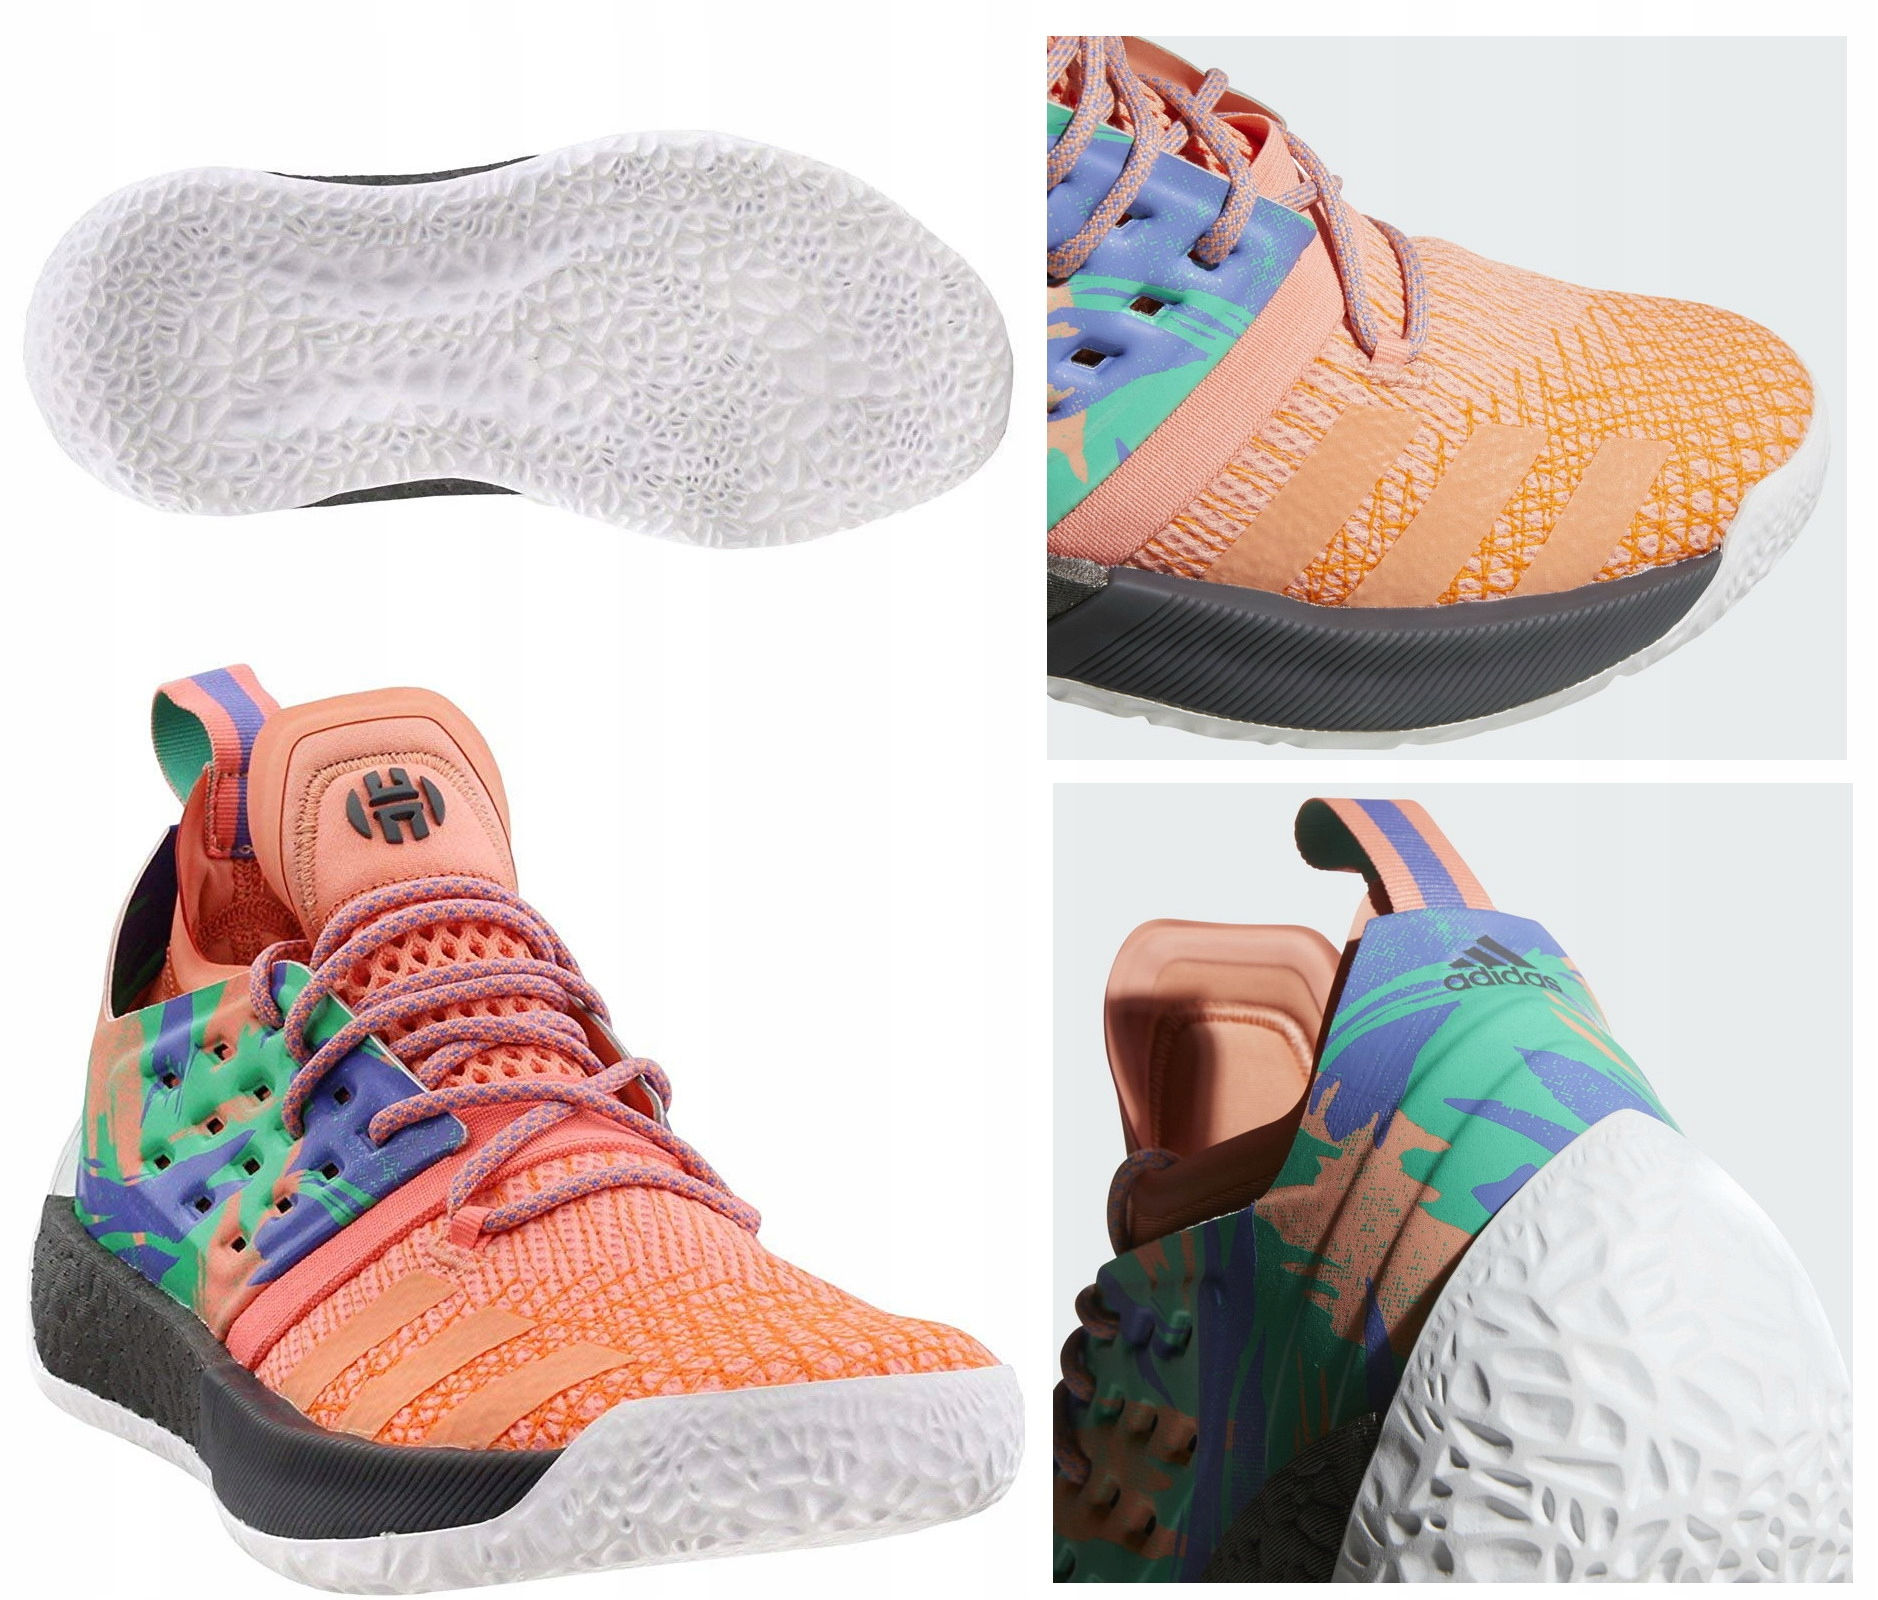 Adidas Harden Vol.2 Boost buty koszykarskie 41 13